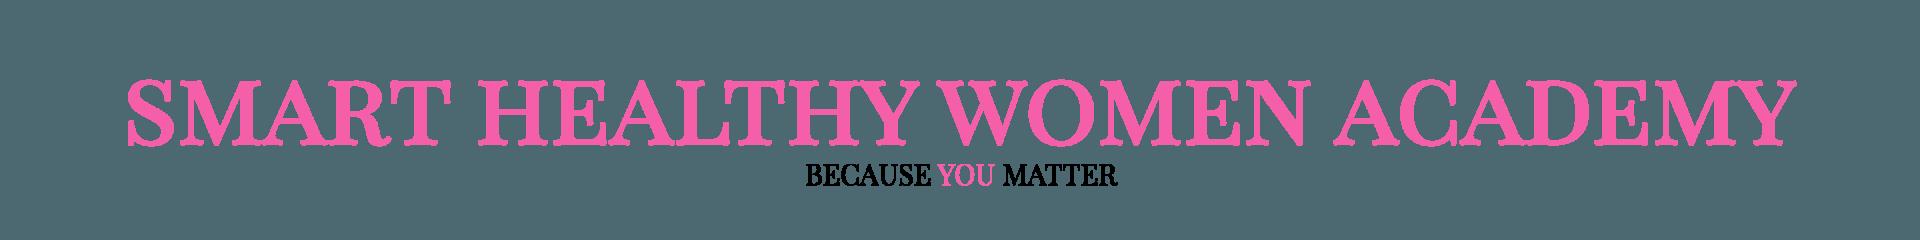 Smart Healthy Women Academy